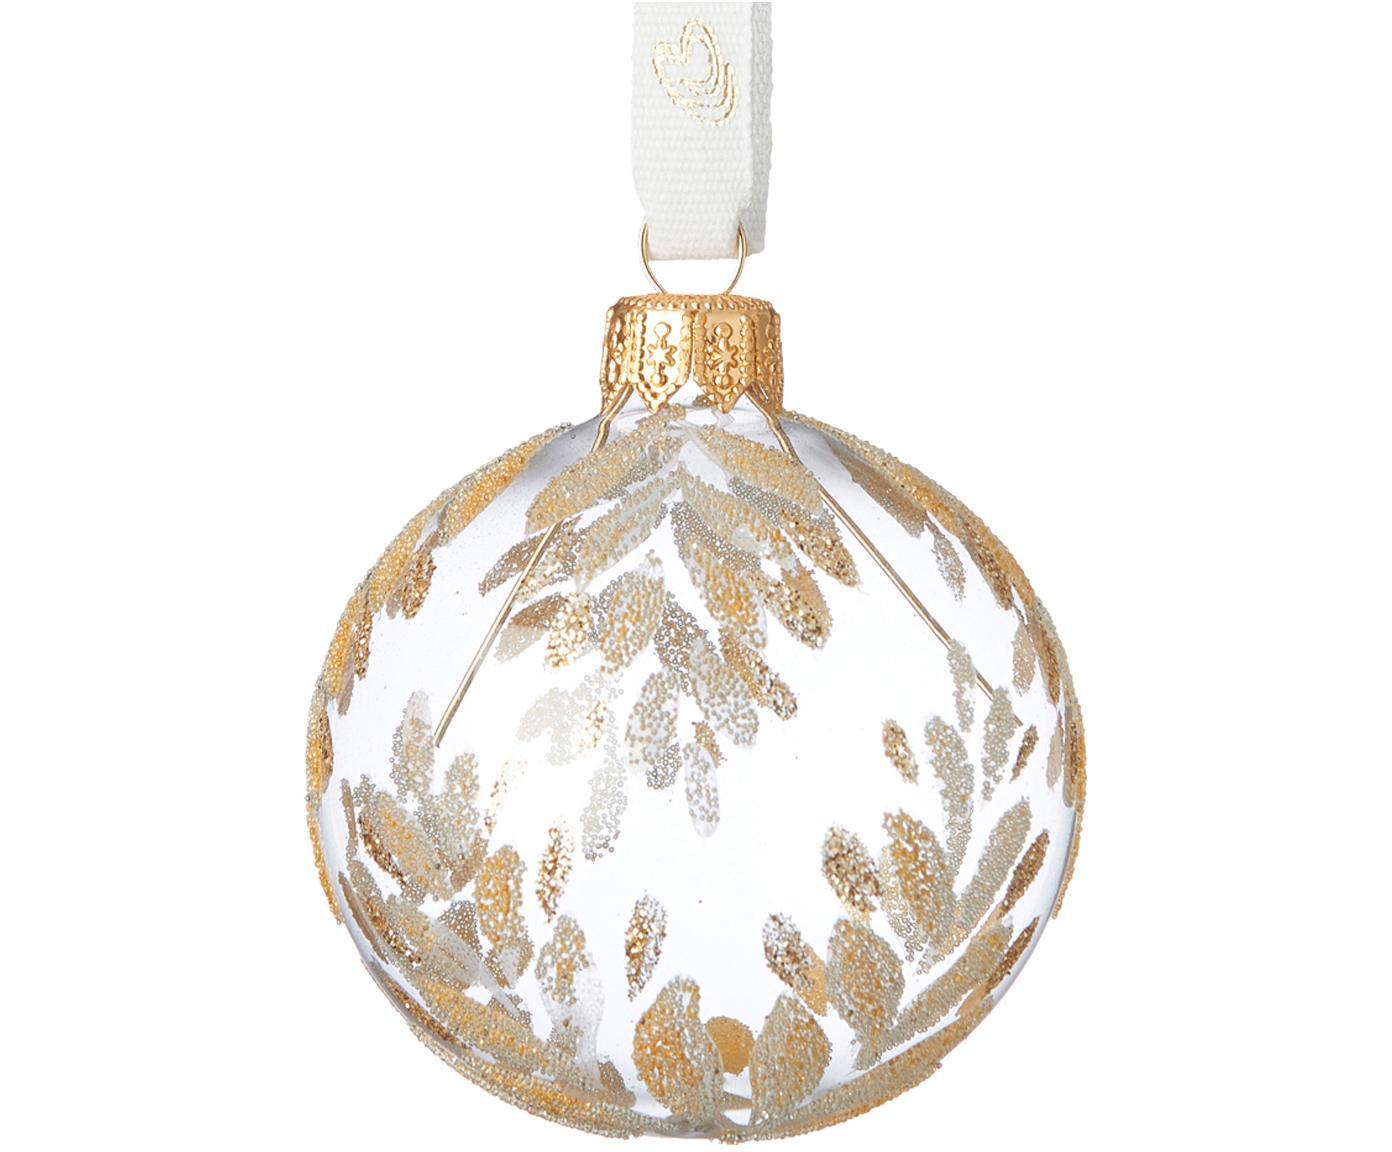 Weihnachtskugeln Cadelia, 2 Stück, Transparent, Goldfarben, Ø 6 x H 6 cm